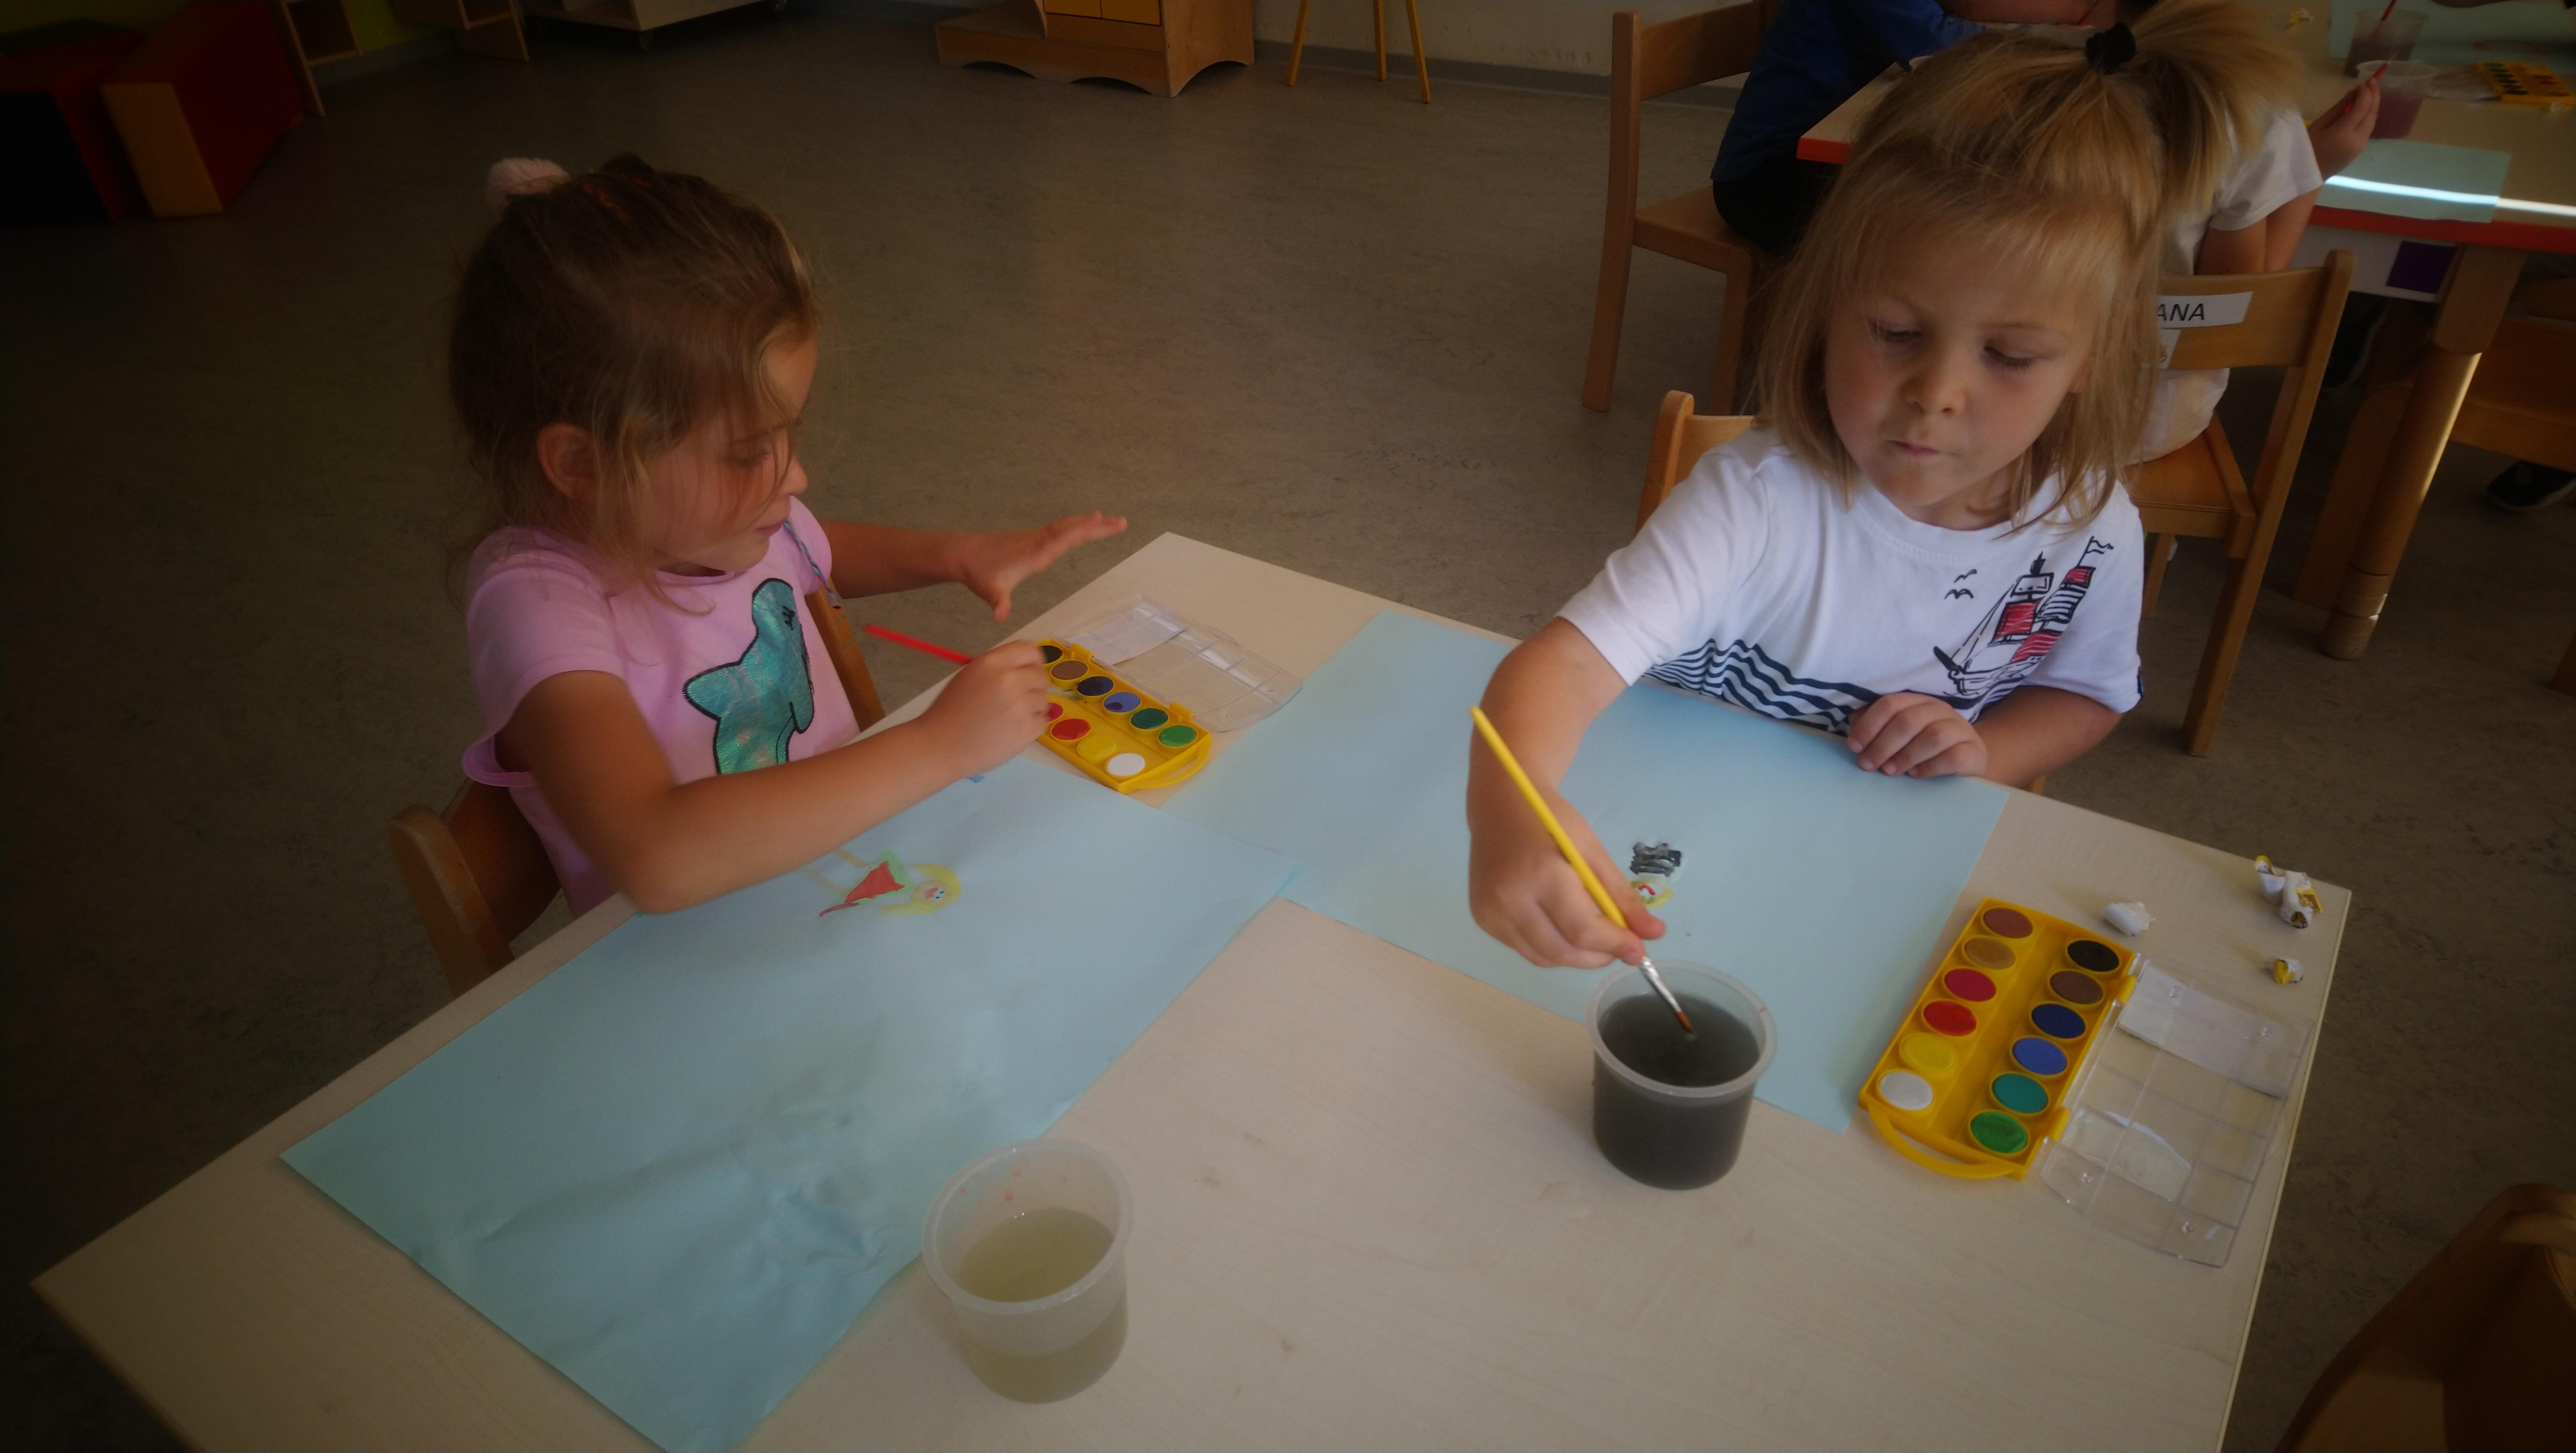 Rodzina namalowana farbami